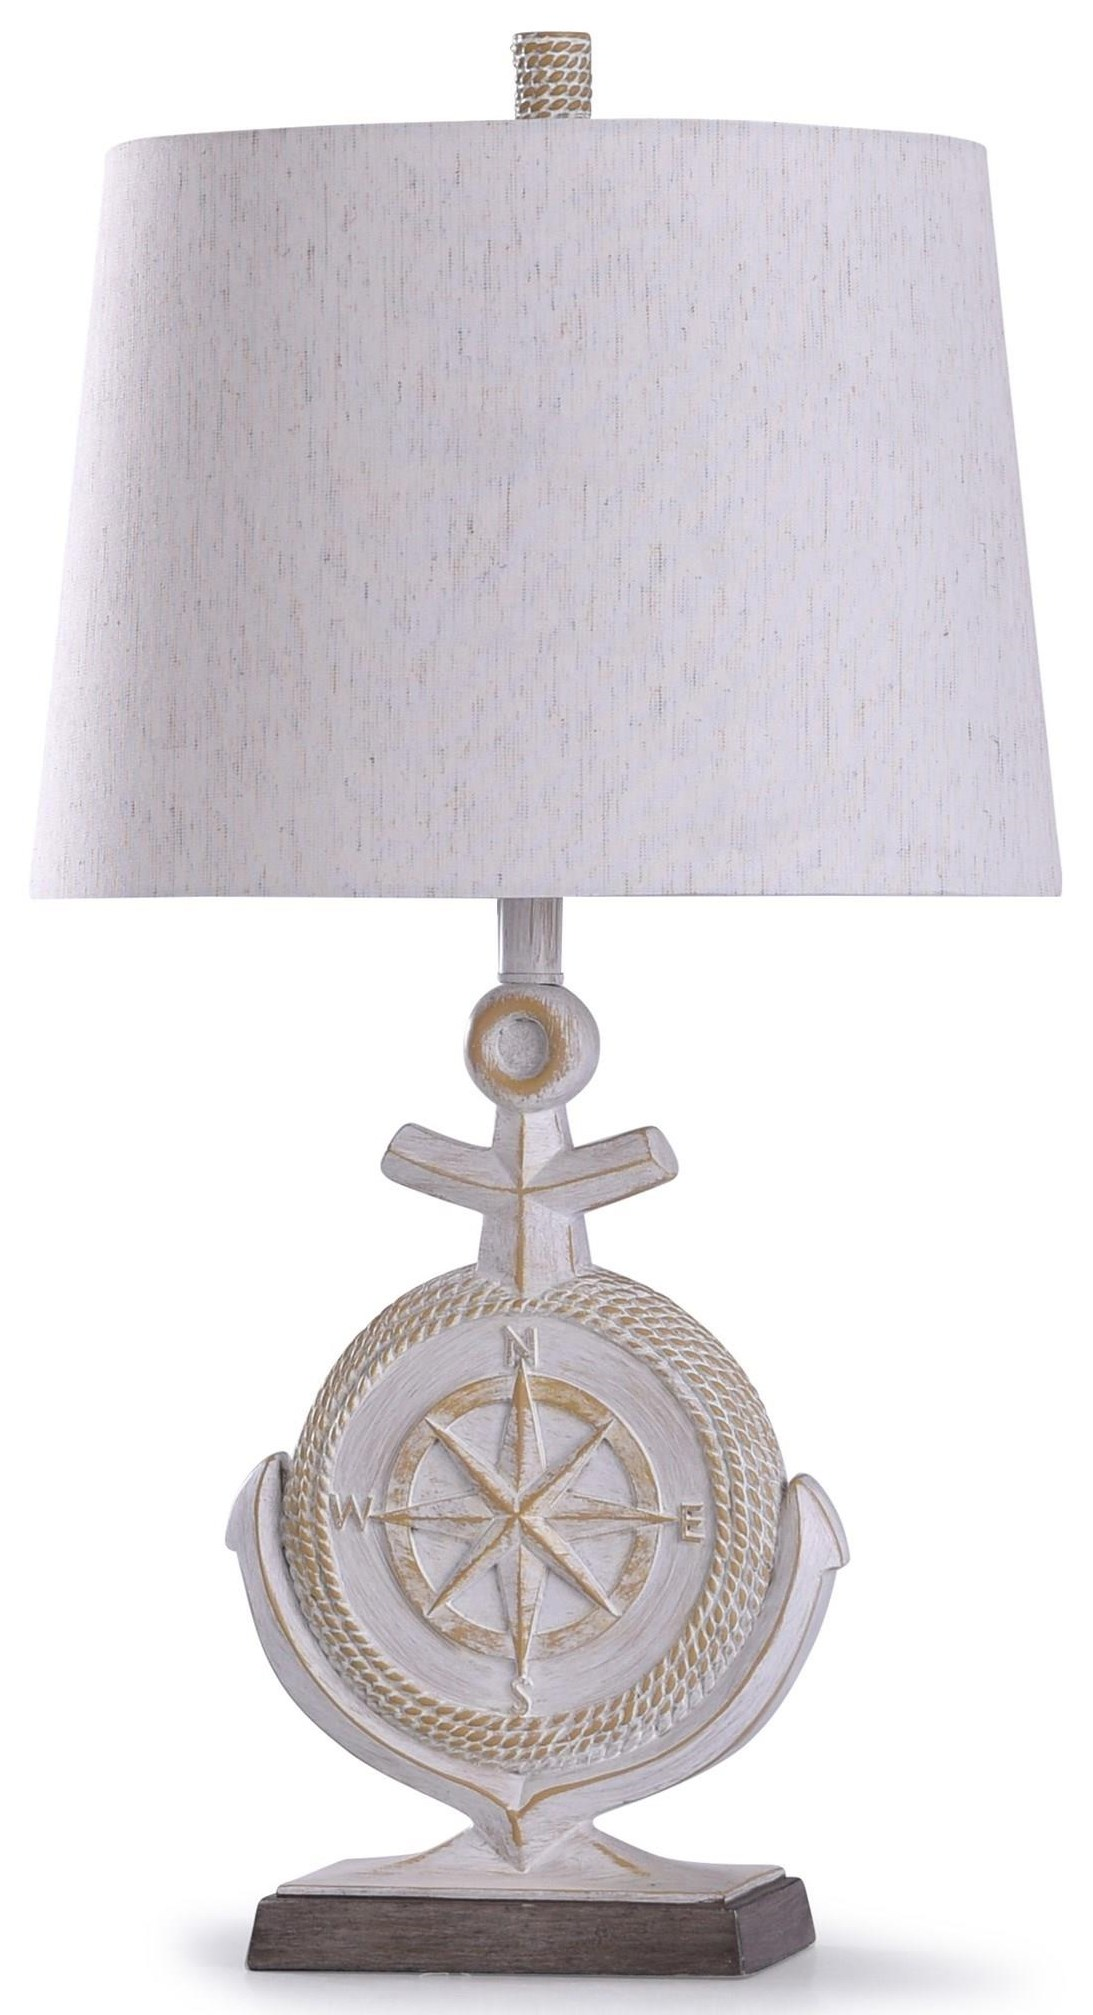 2020 LAMPS Anchor Lamp by StyleCraft at Furniture Fair - North Carolina